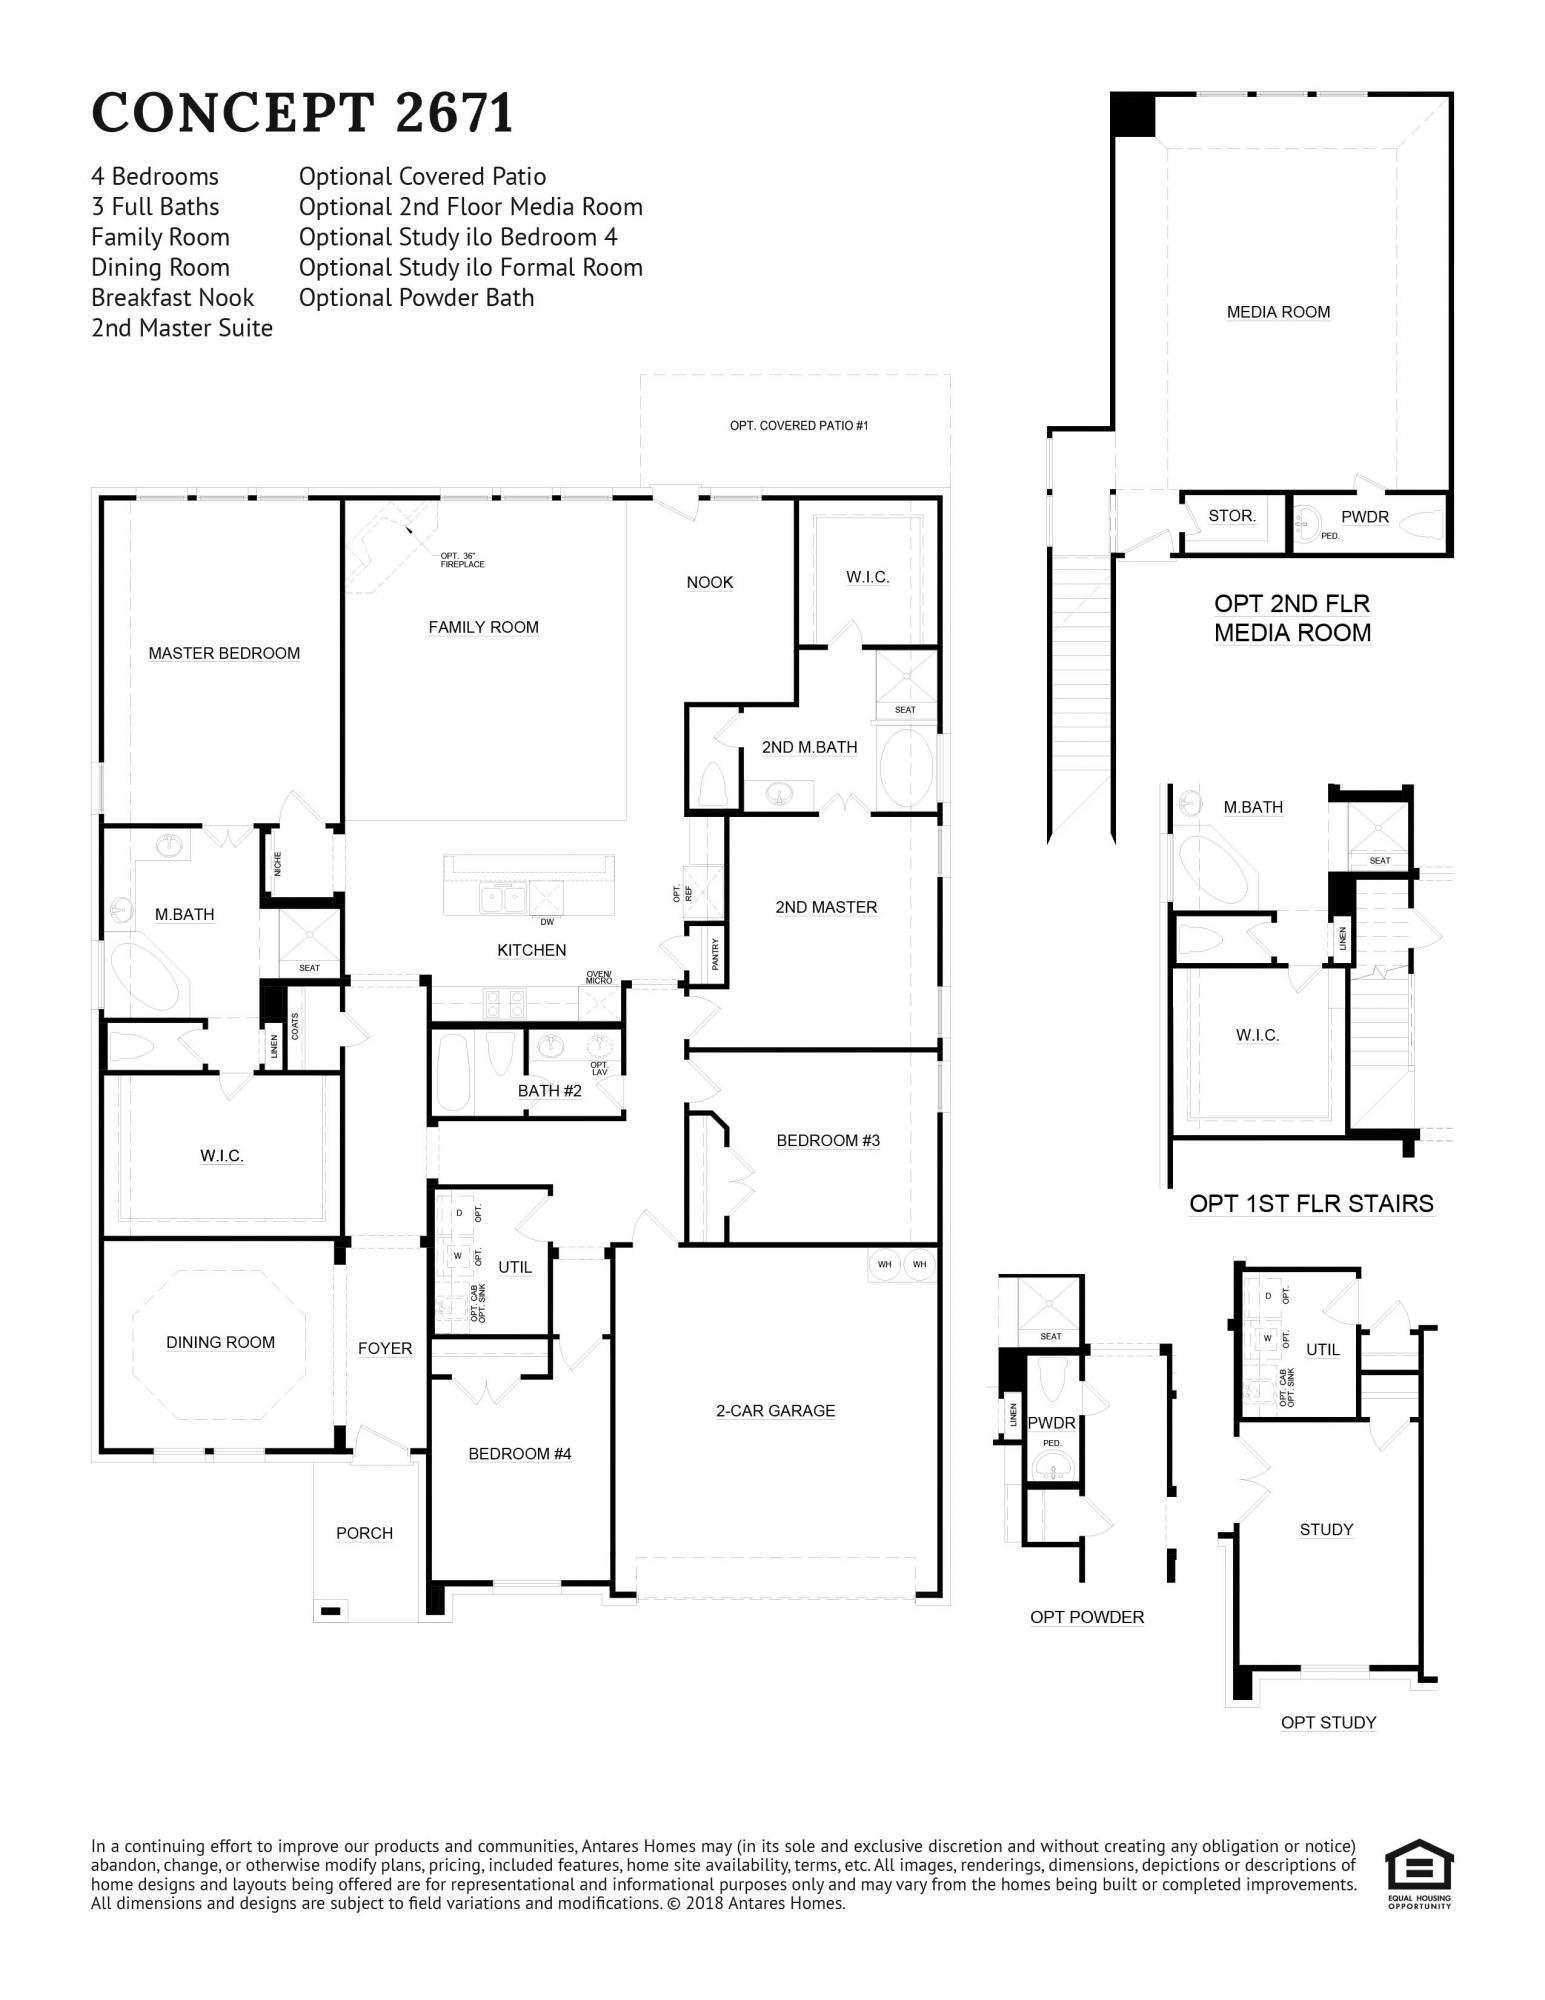 Concept 2671 Floorplan